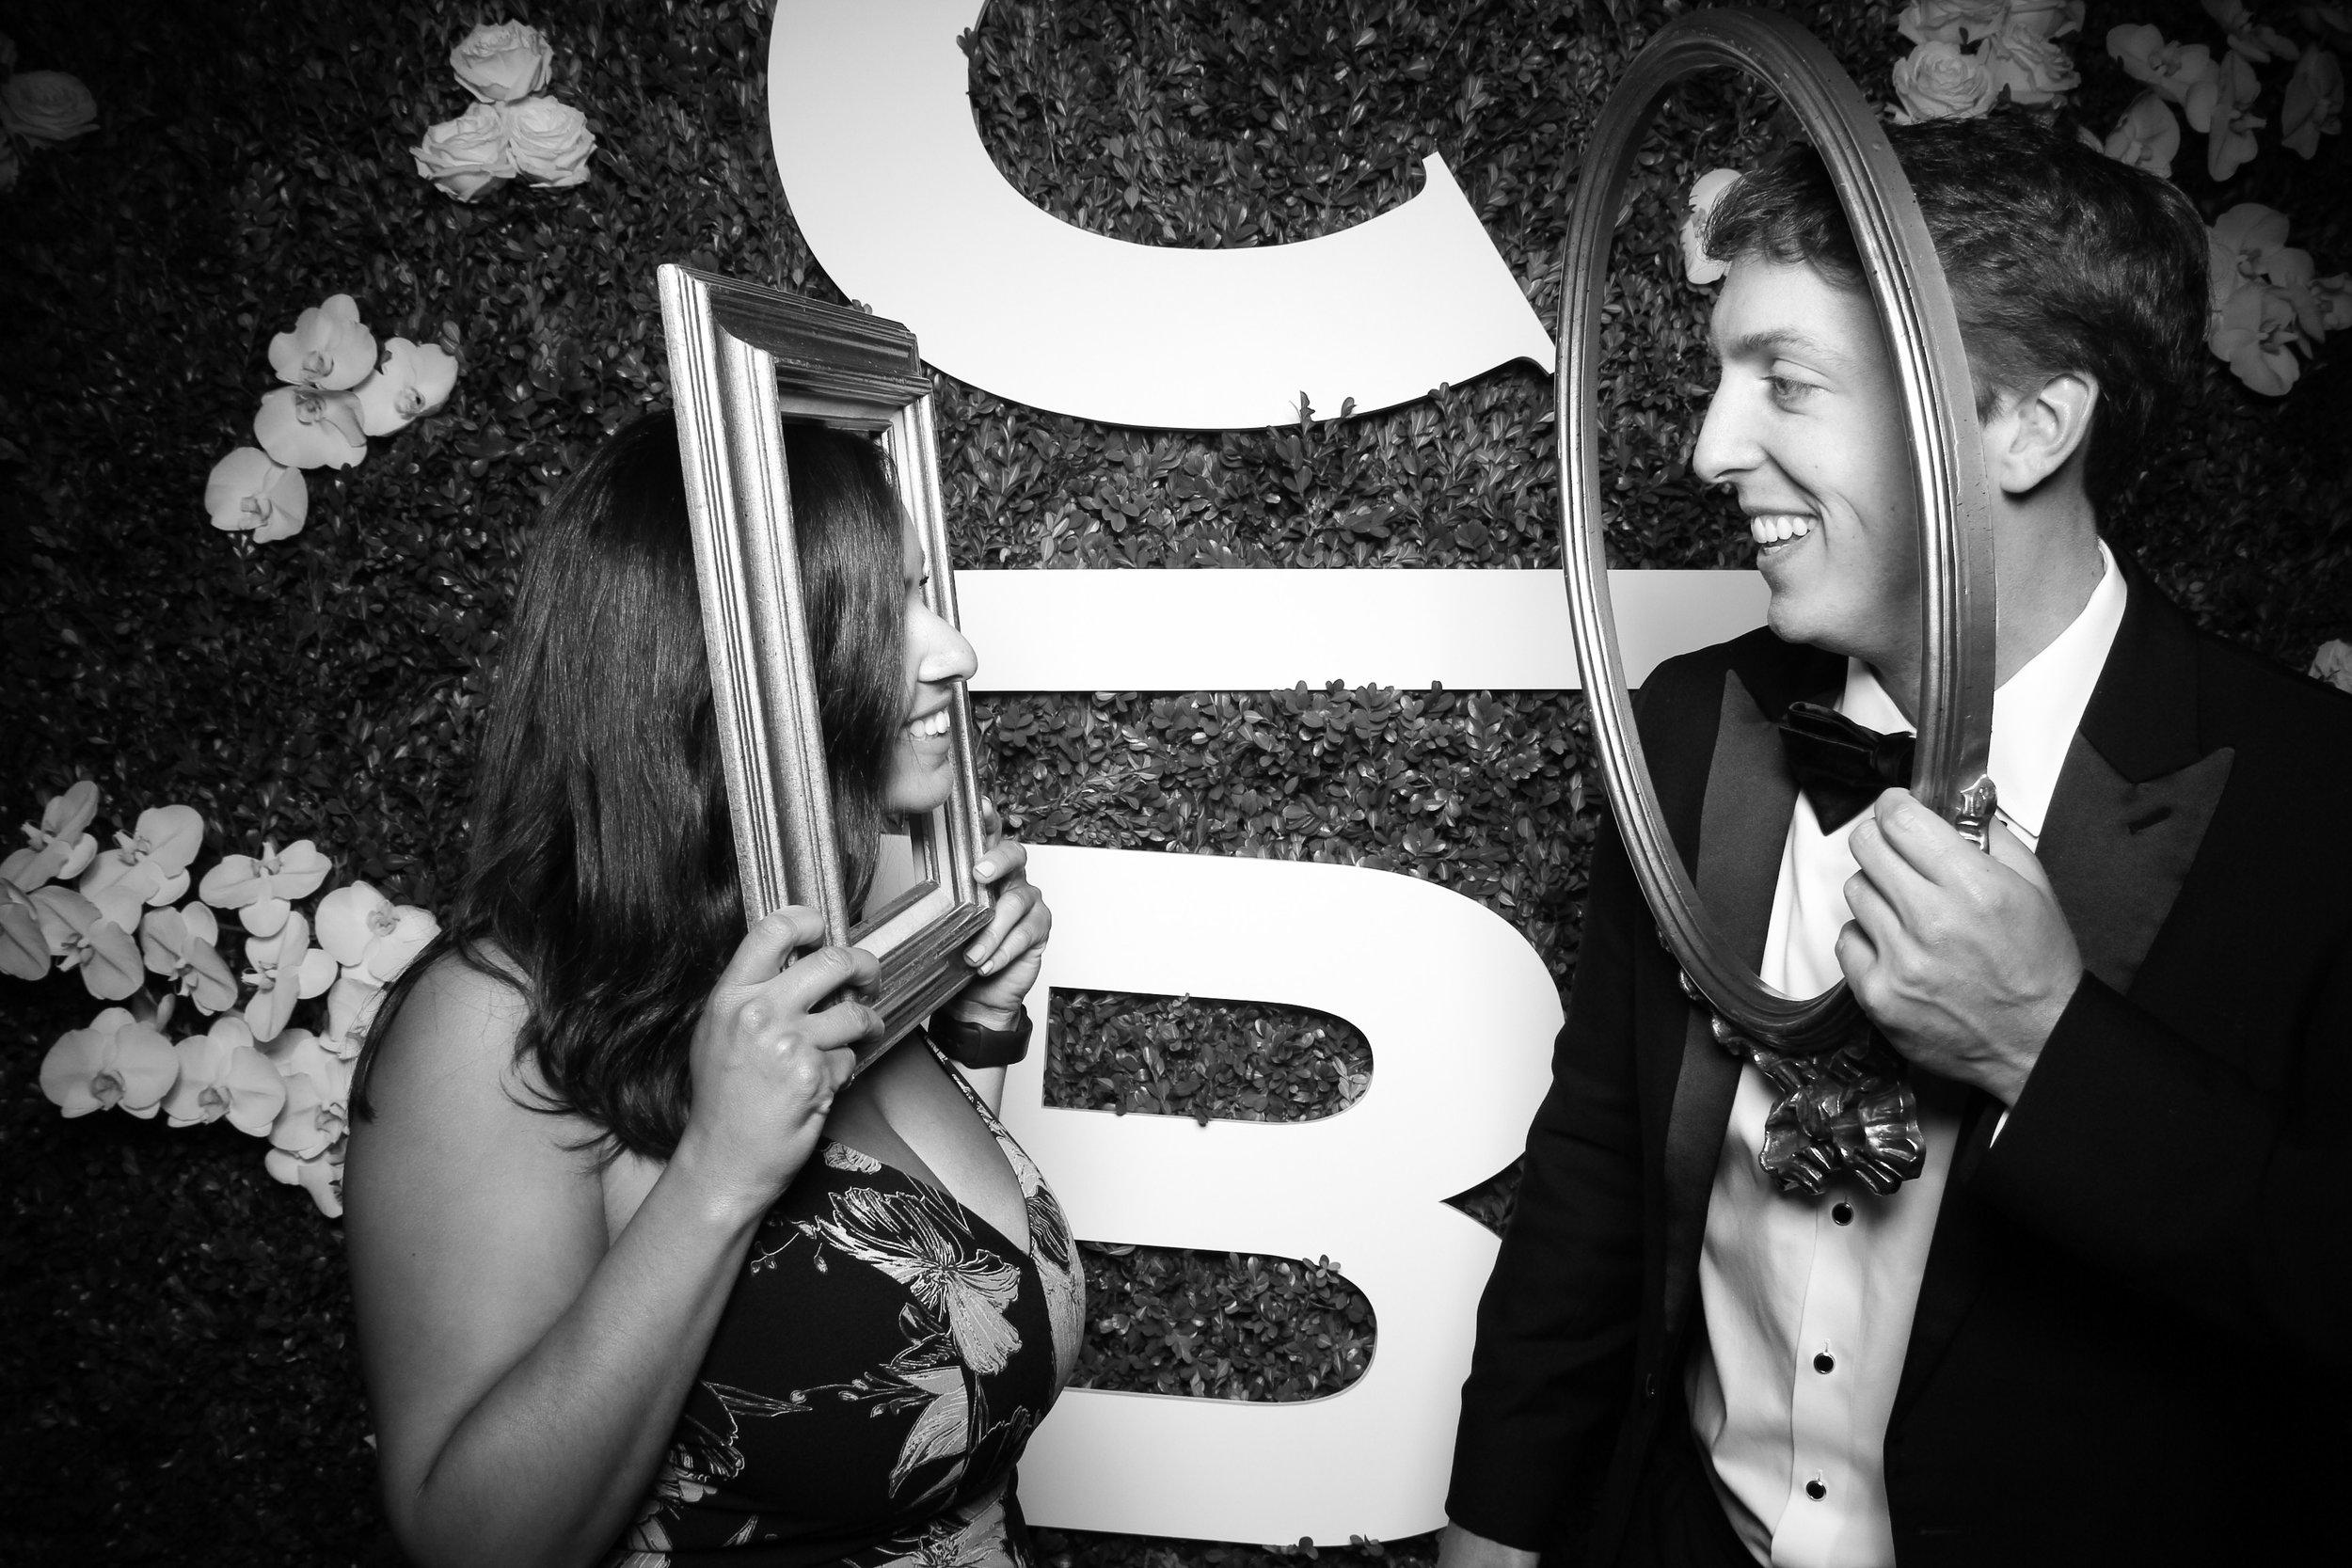 Peninsula_Hotel_Chicago_Wedding_Photo_Booth_07.jpg